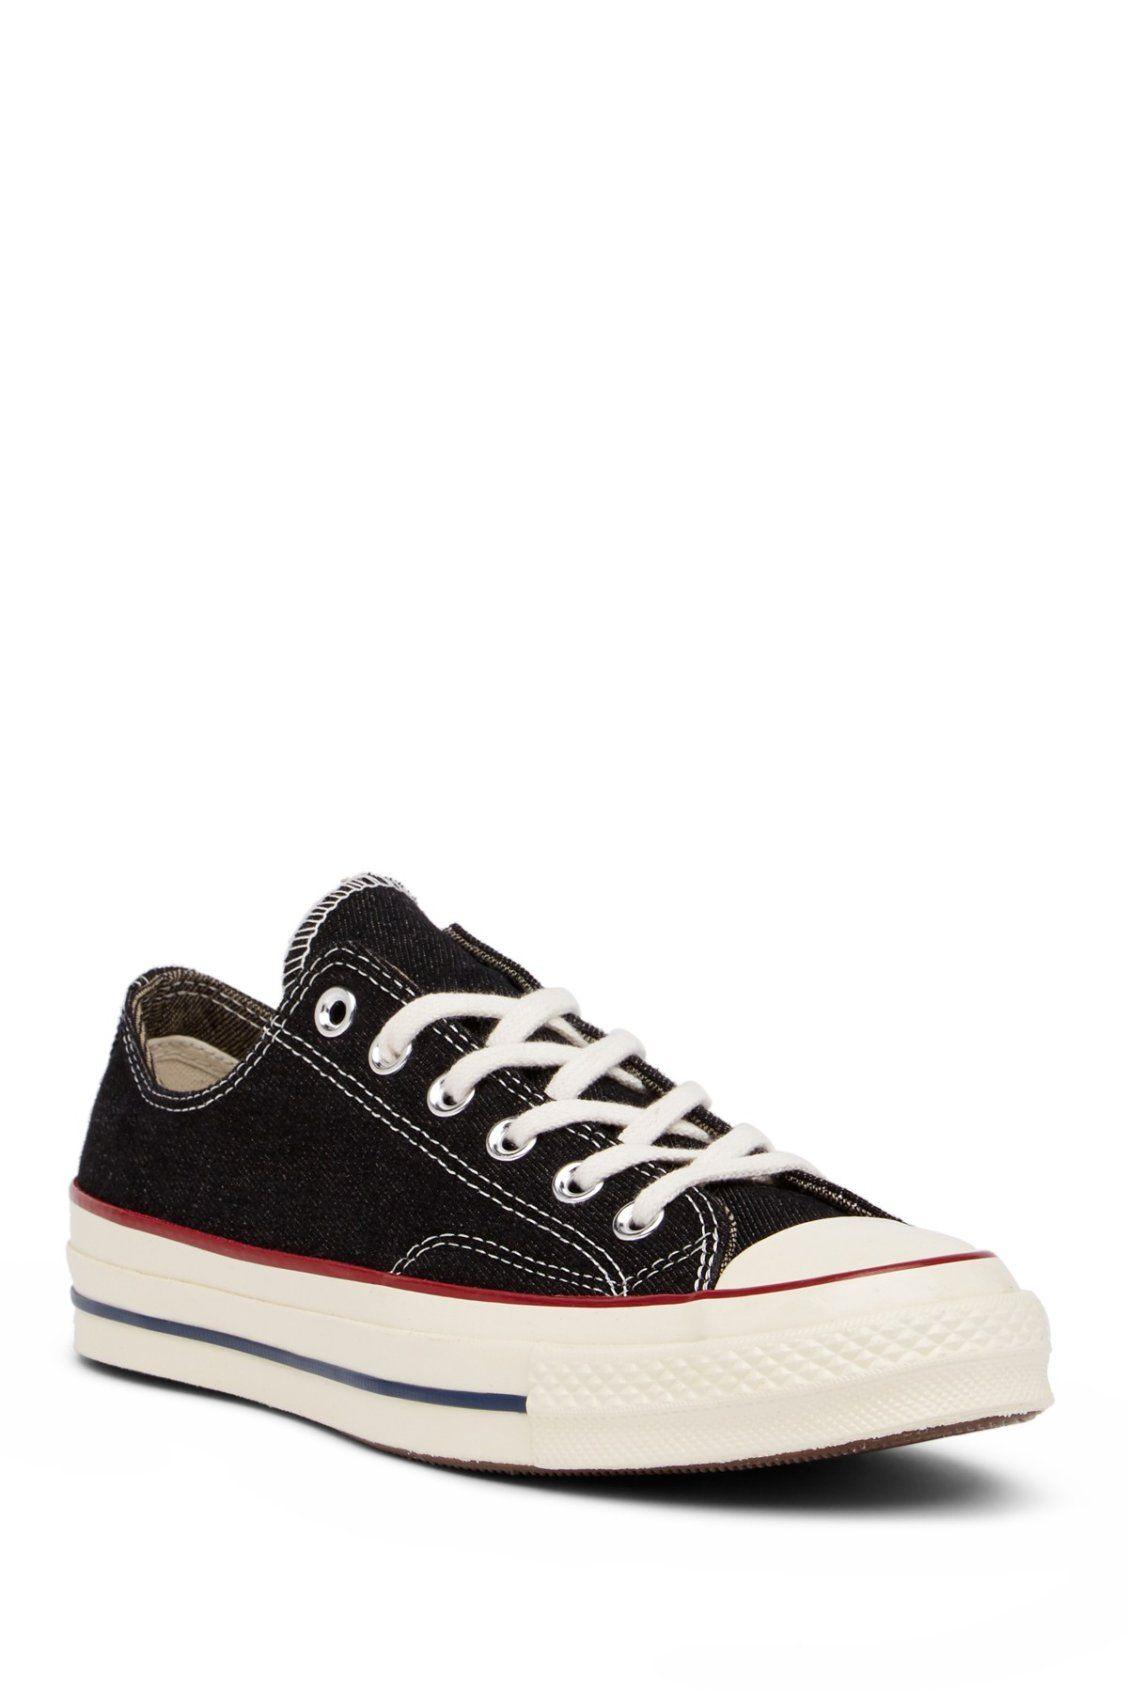 f6f93de512d76 Classic Black Converse Chuck Taylor All Star 70 s Woven Sneakers ...